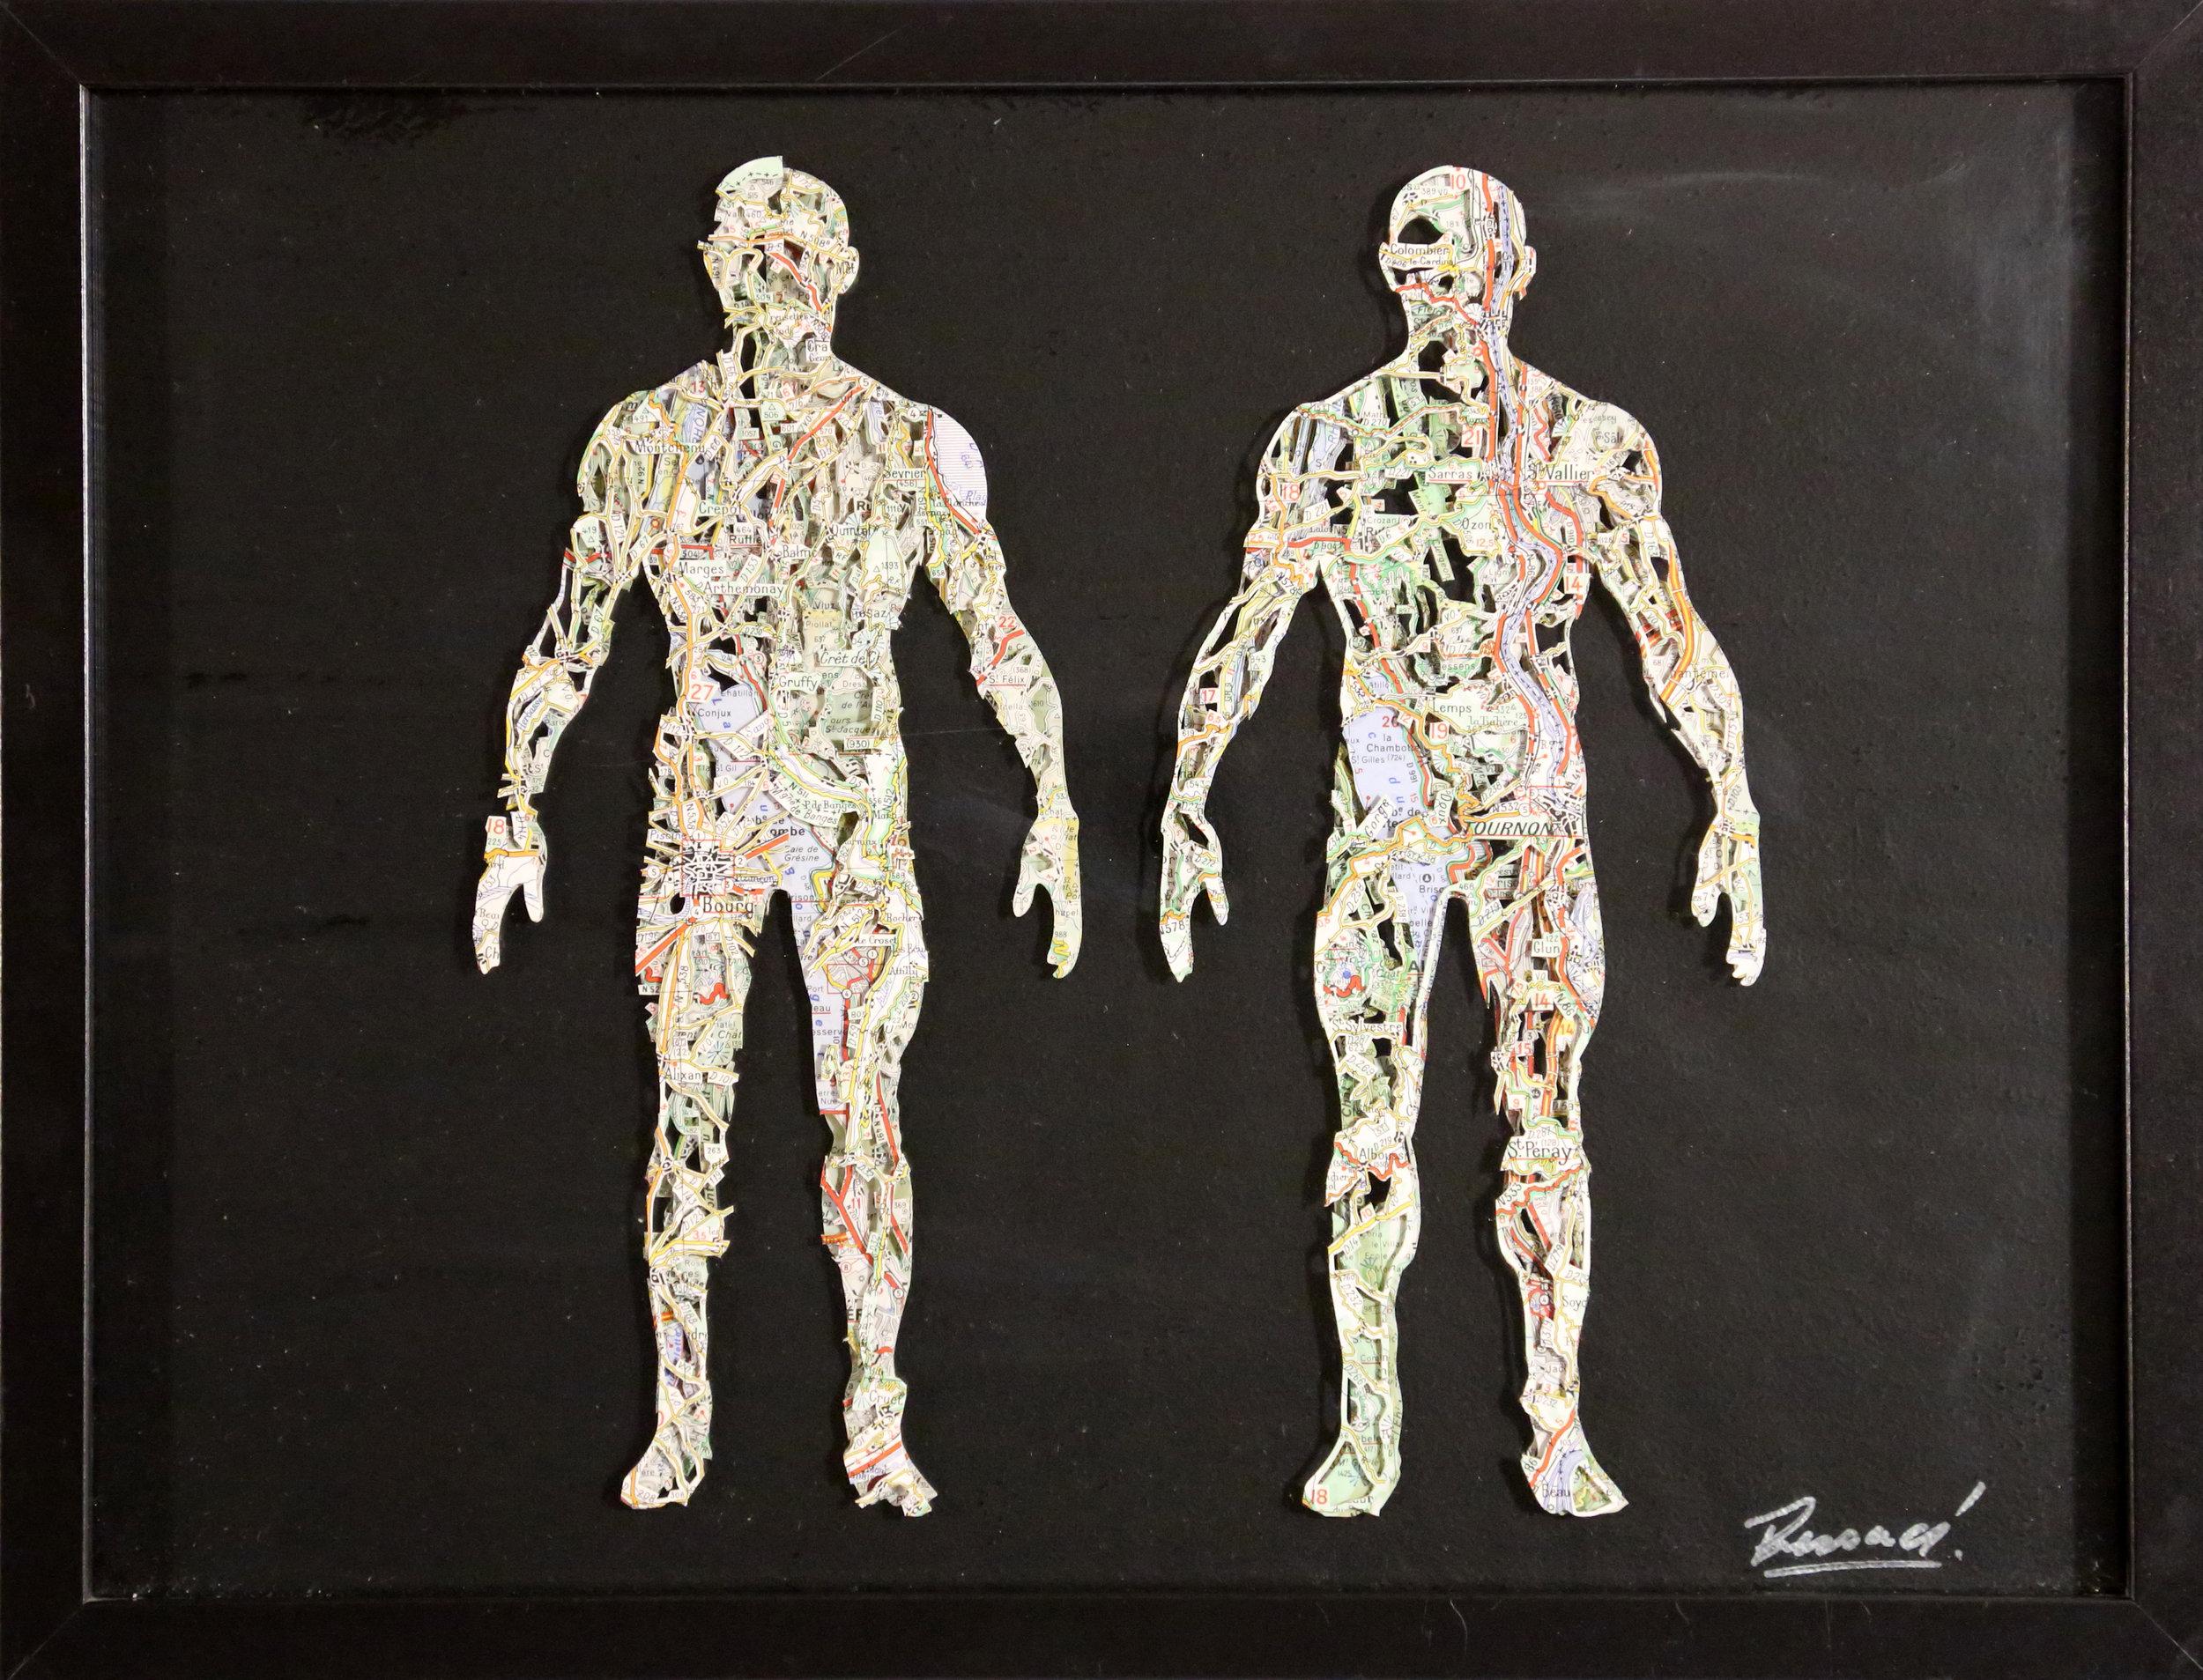 GalleryOonH-Joanathan Bessaci-Anatomy 1-2017-Michelin maps and glass-12x16-1000.jpg